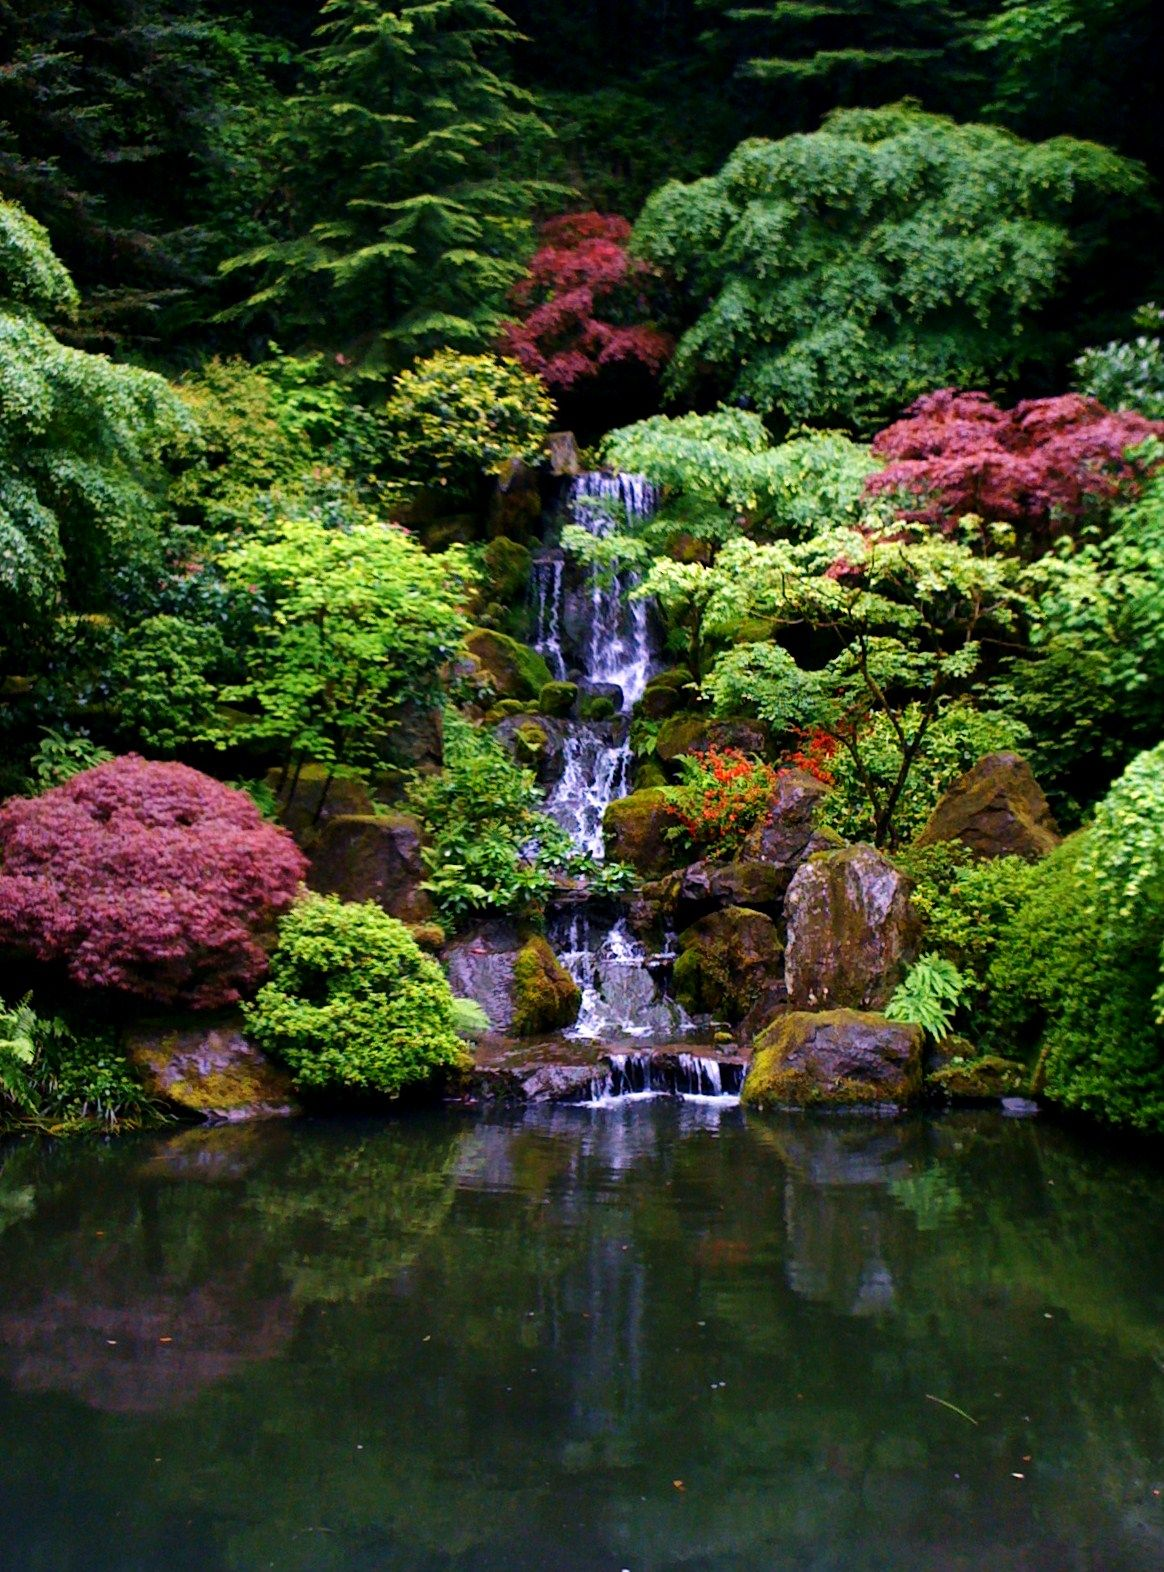 Jard n estilo japon s naturaleza espontanea by fg for Jardin estilo japones